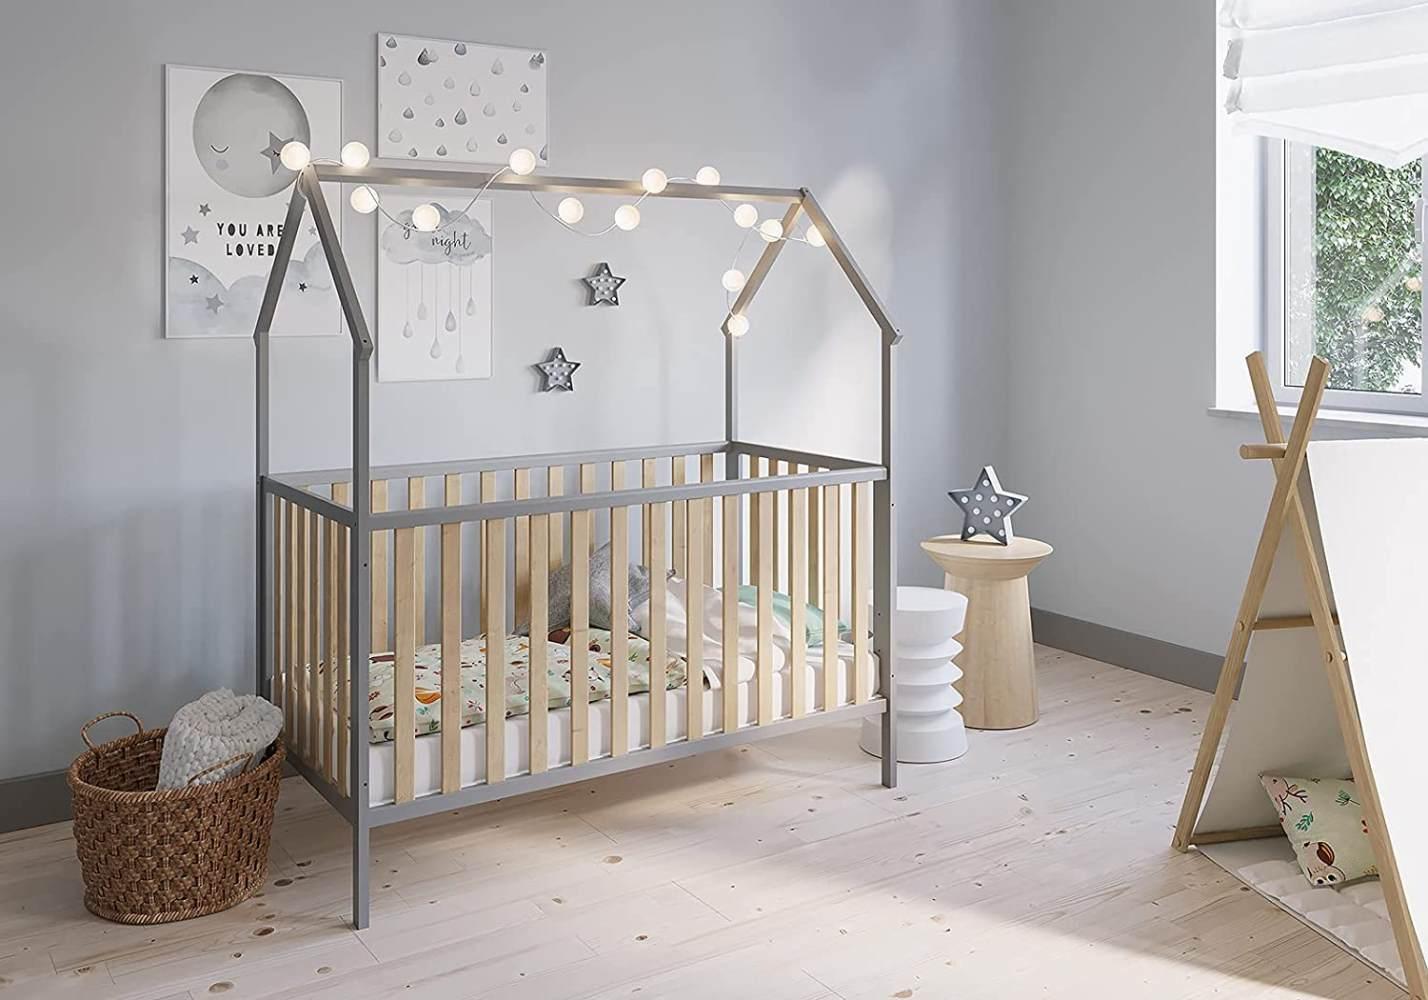 FabiMax 'Schlafmütze' Kinderbett, 70 x 140 cm, grau/natur, mit Matratze Classic, Kiefer massiv, 3-fach höhenverstellbar, umbaubar Bild 1